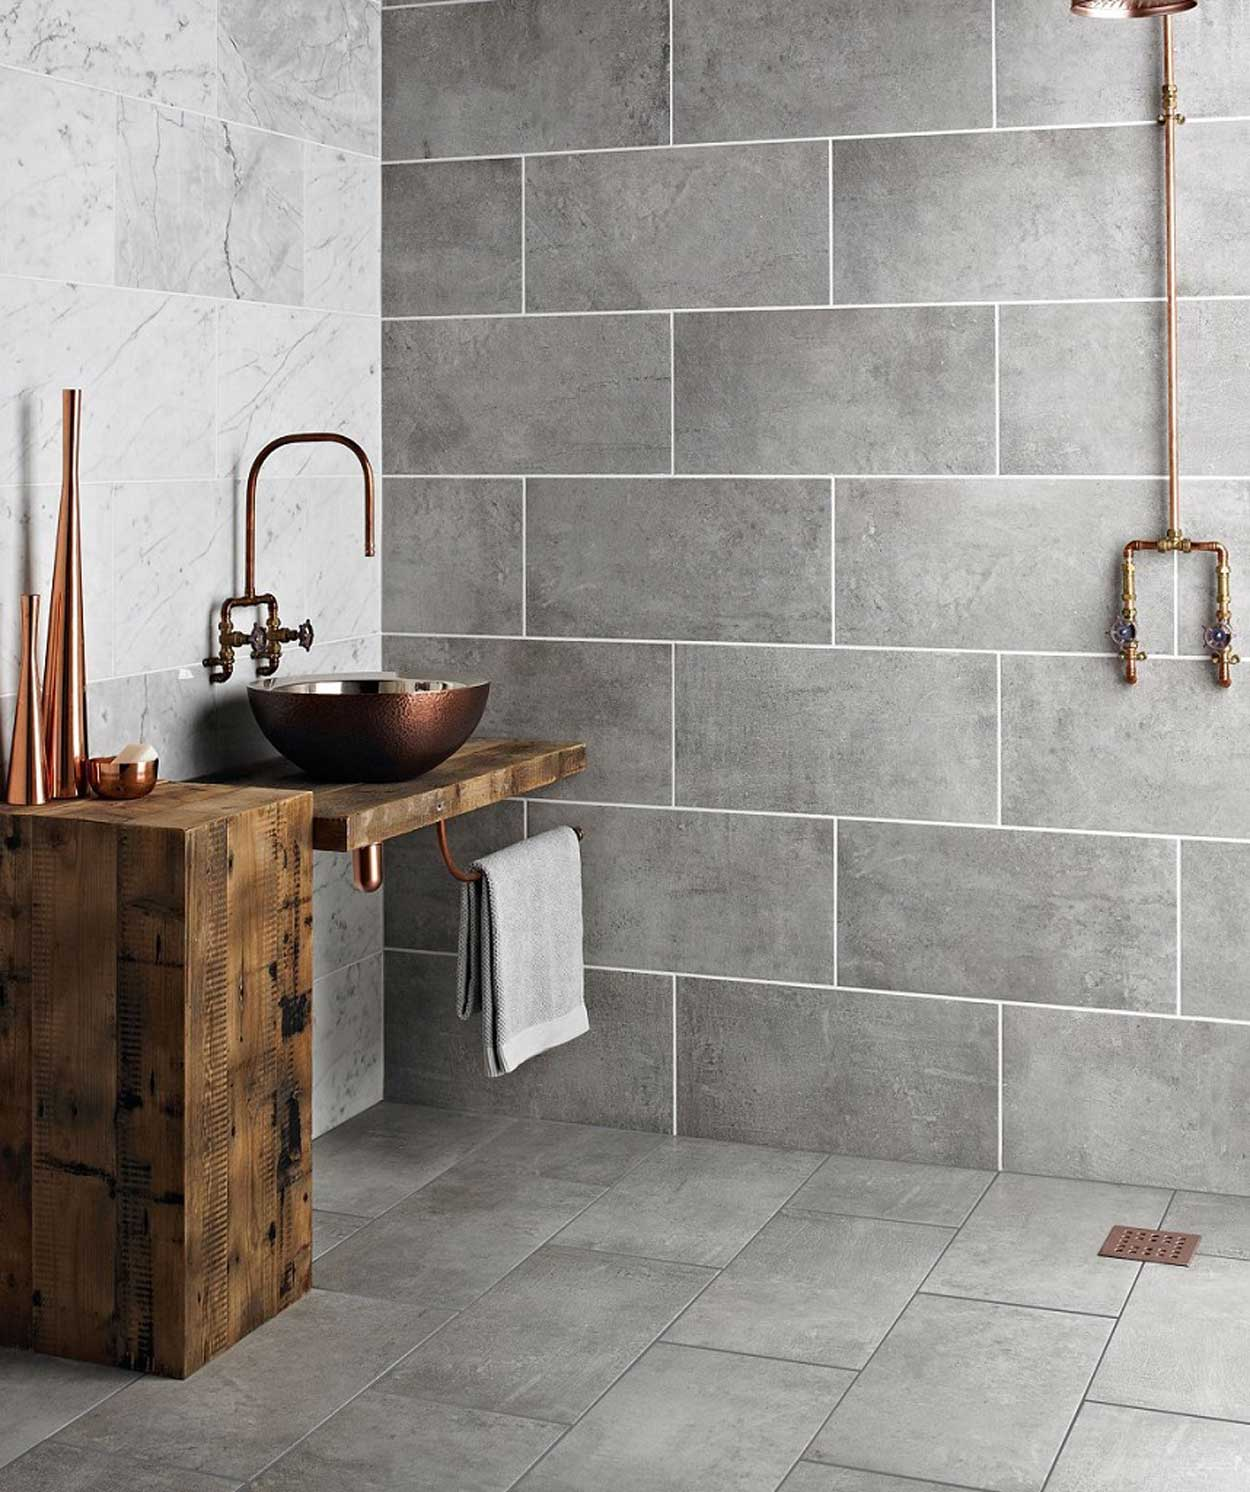 Brampton-Wetrooms-and-Bathrooms-Northampton